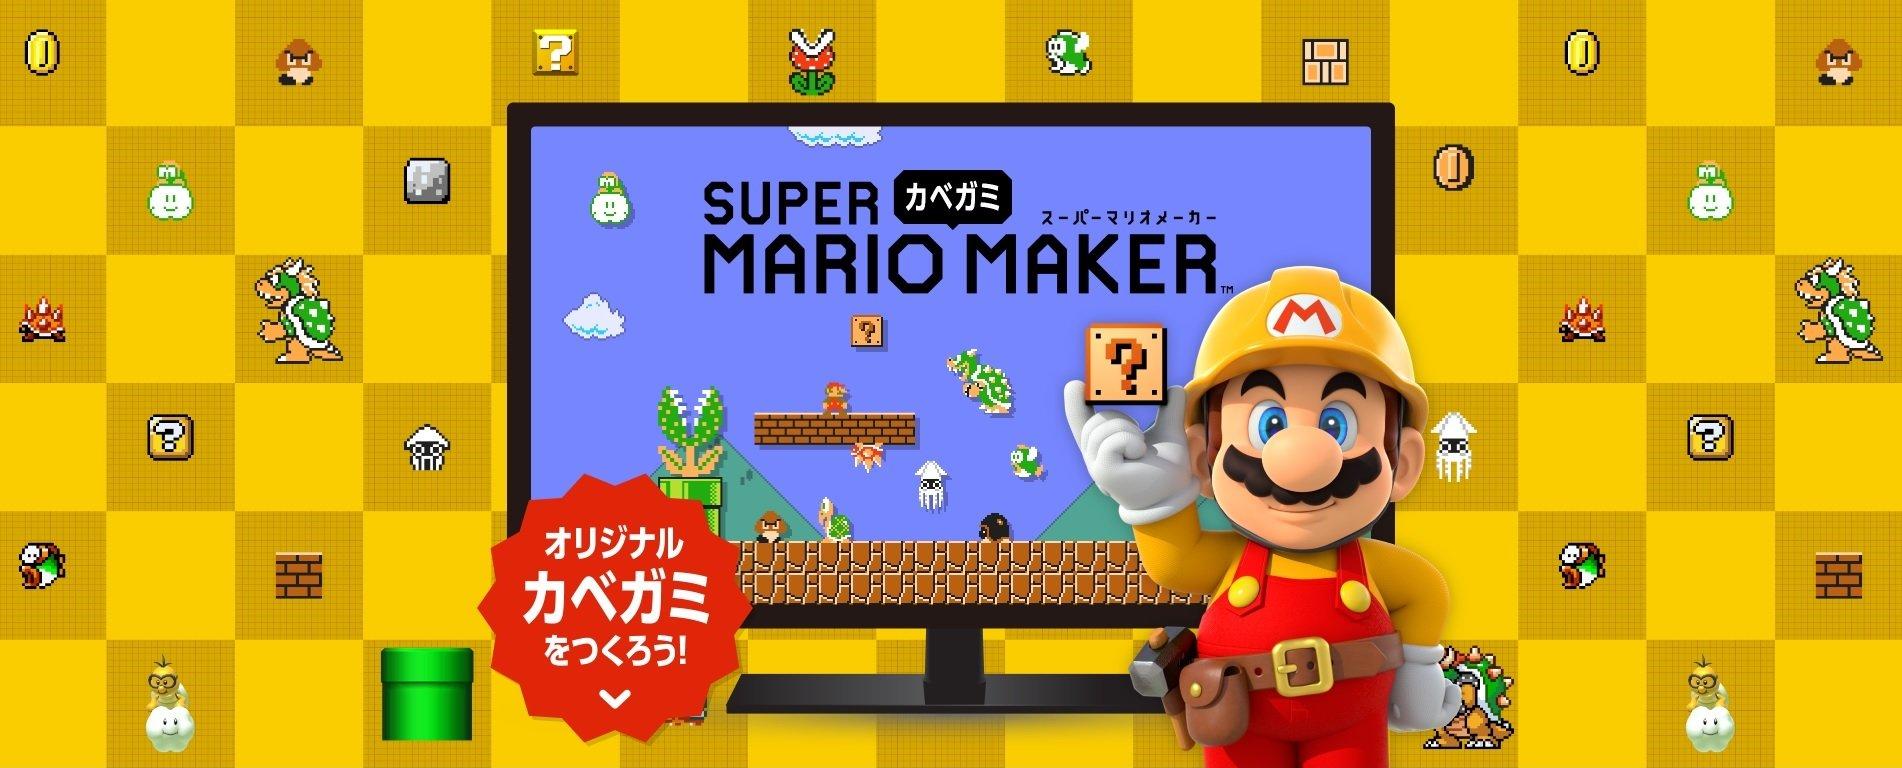 Super Mario Maker: Design Your Own Desktop Wallpaper - Rice Digital ...